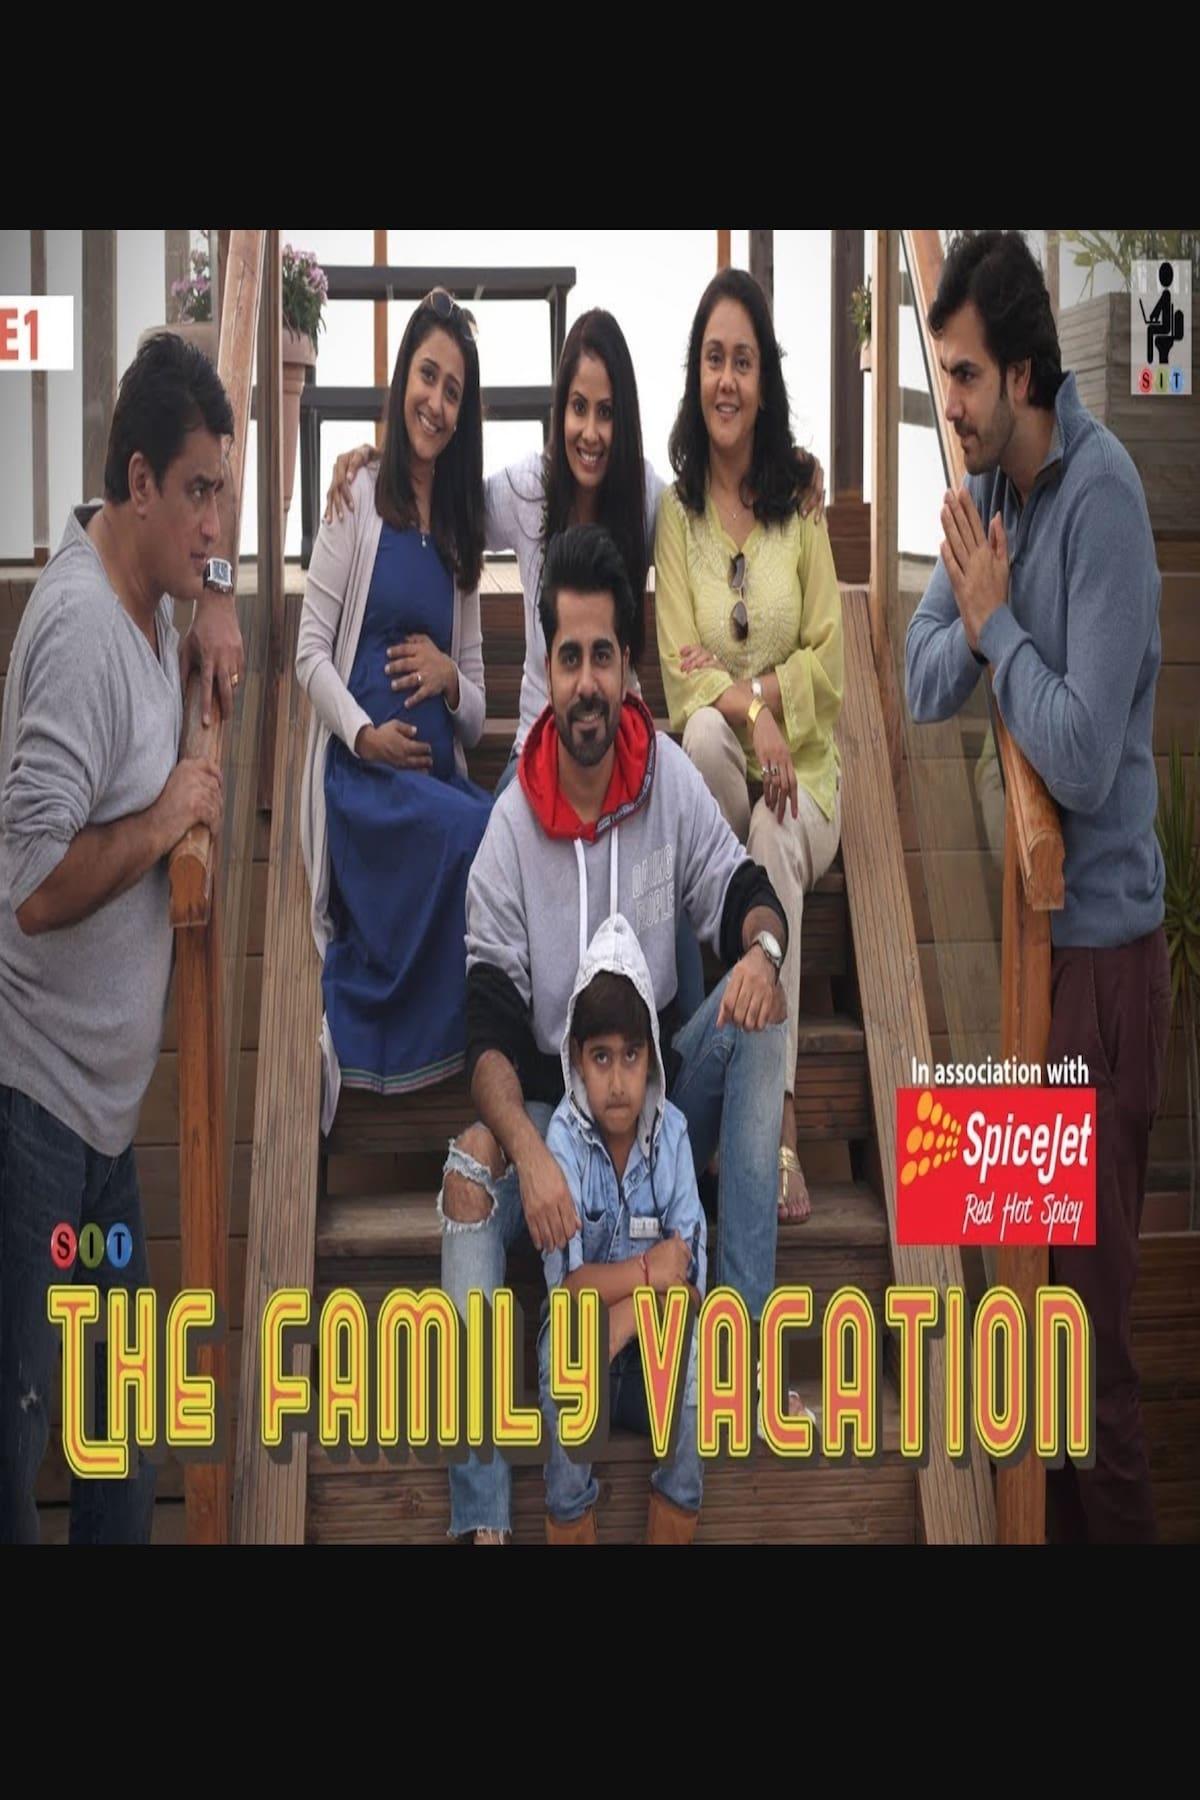 The Family Vacation